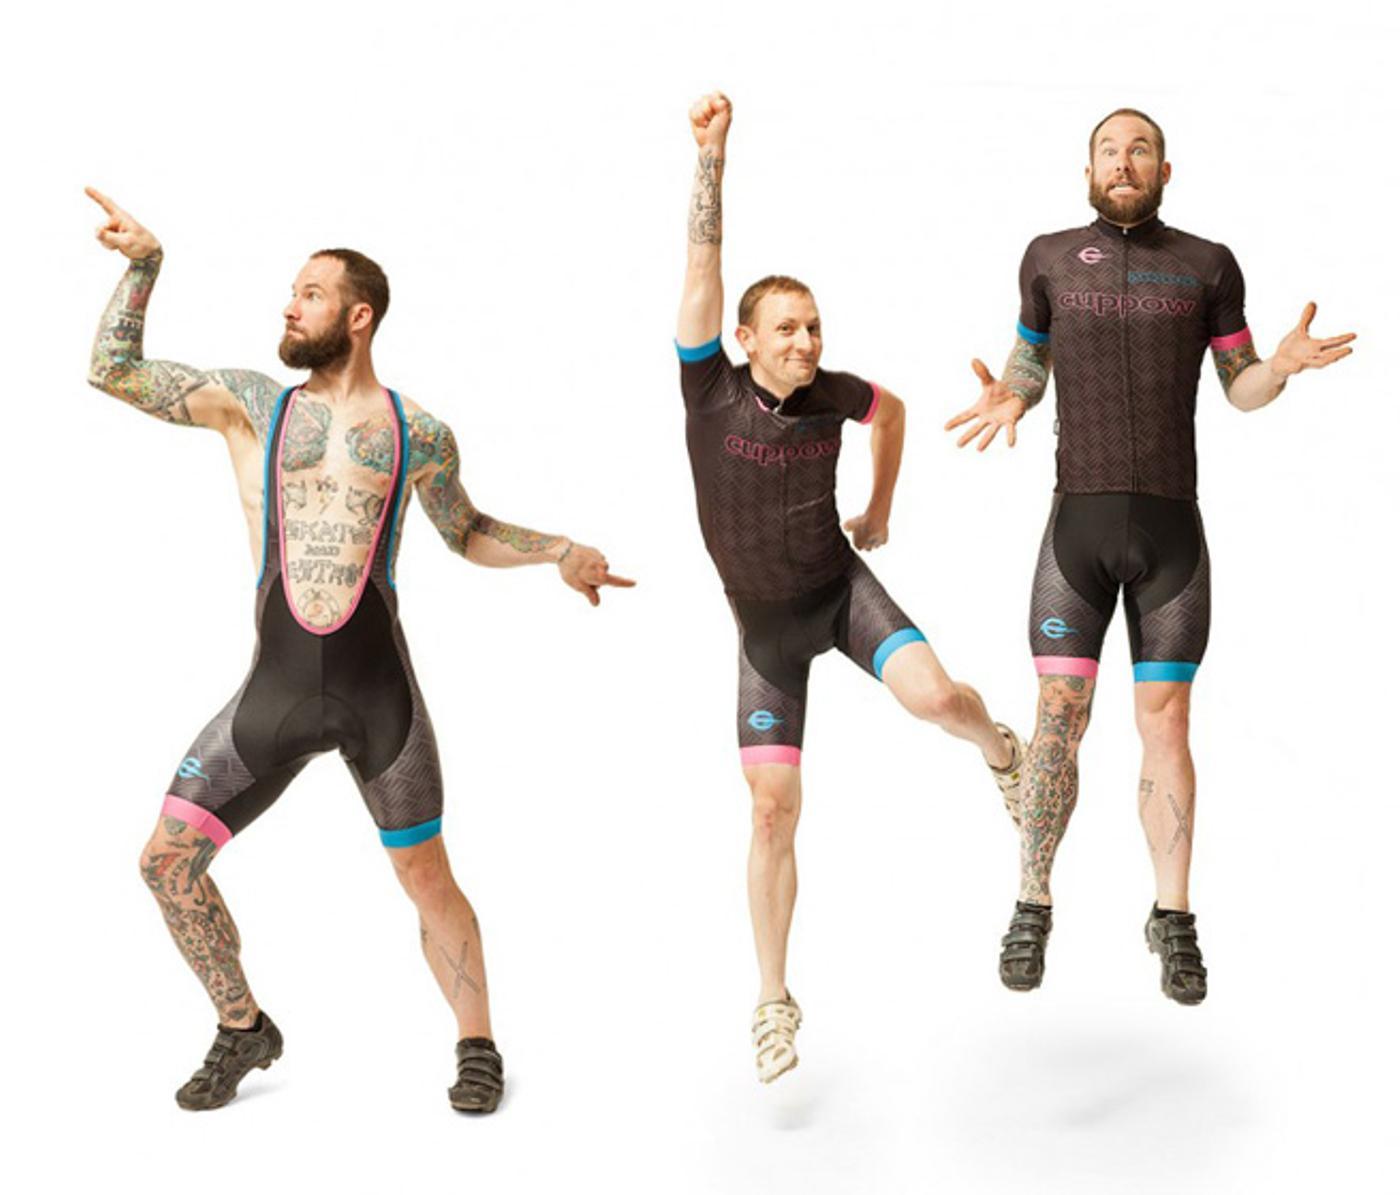 Geekhouse Bikes and Cuppow Club Kit Pre-Order